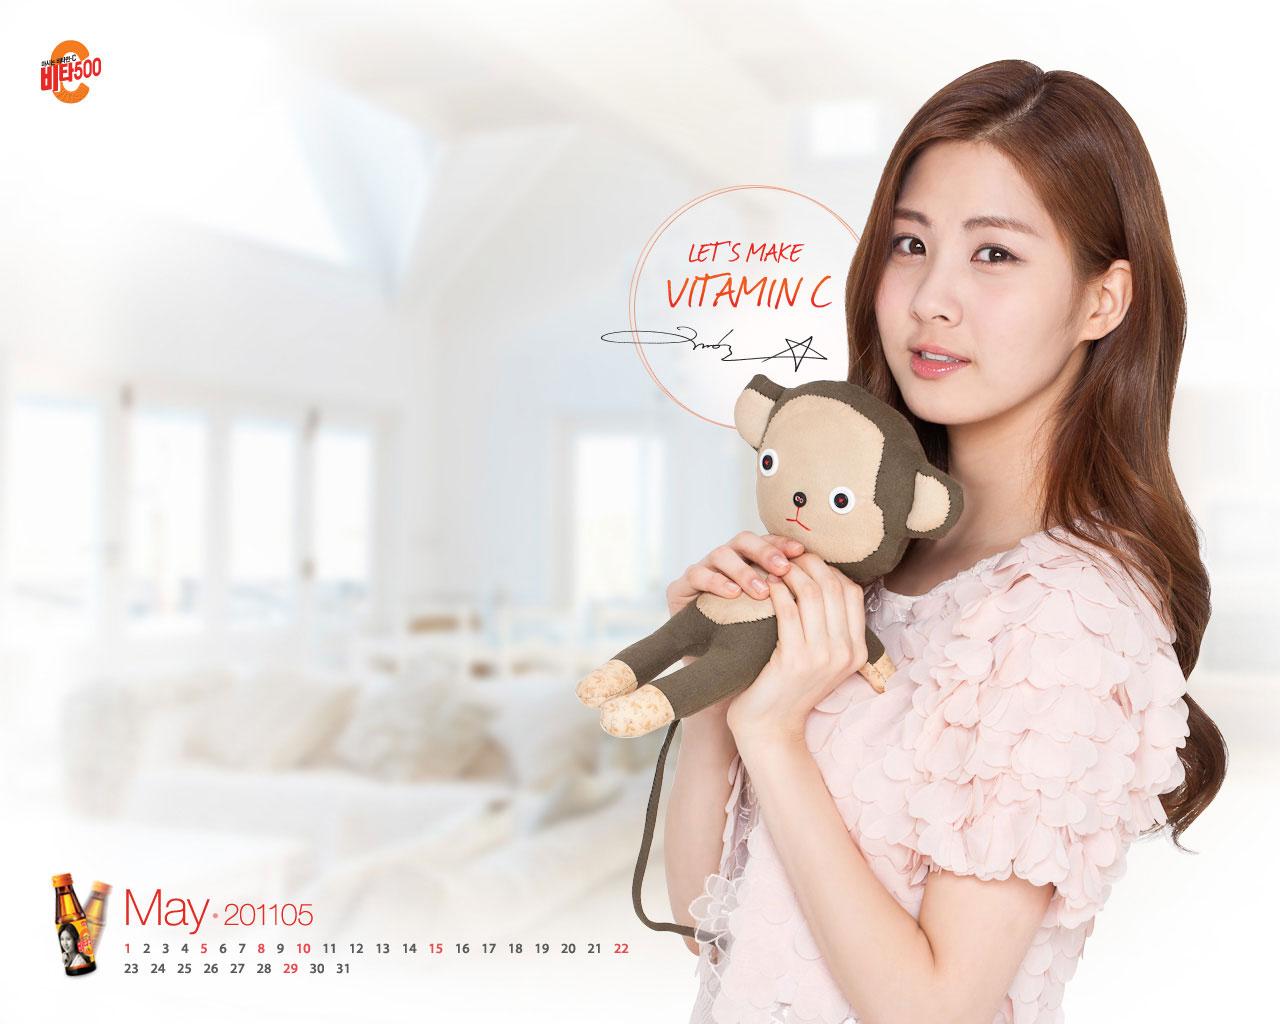 http://3.bp.blogspot.com/-UlyOplv_8jg/UEMsjRT_MYI/AAAAAAAAF8A/1HfDhCn6hOk/s1600/Seohyun+SNSD+and+her+Monkey+Doll+Wallpaper.jpg